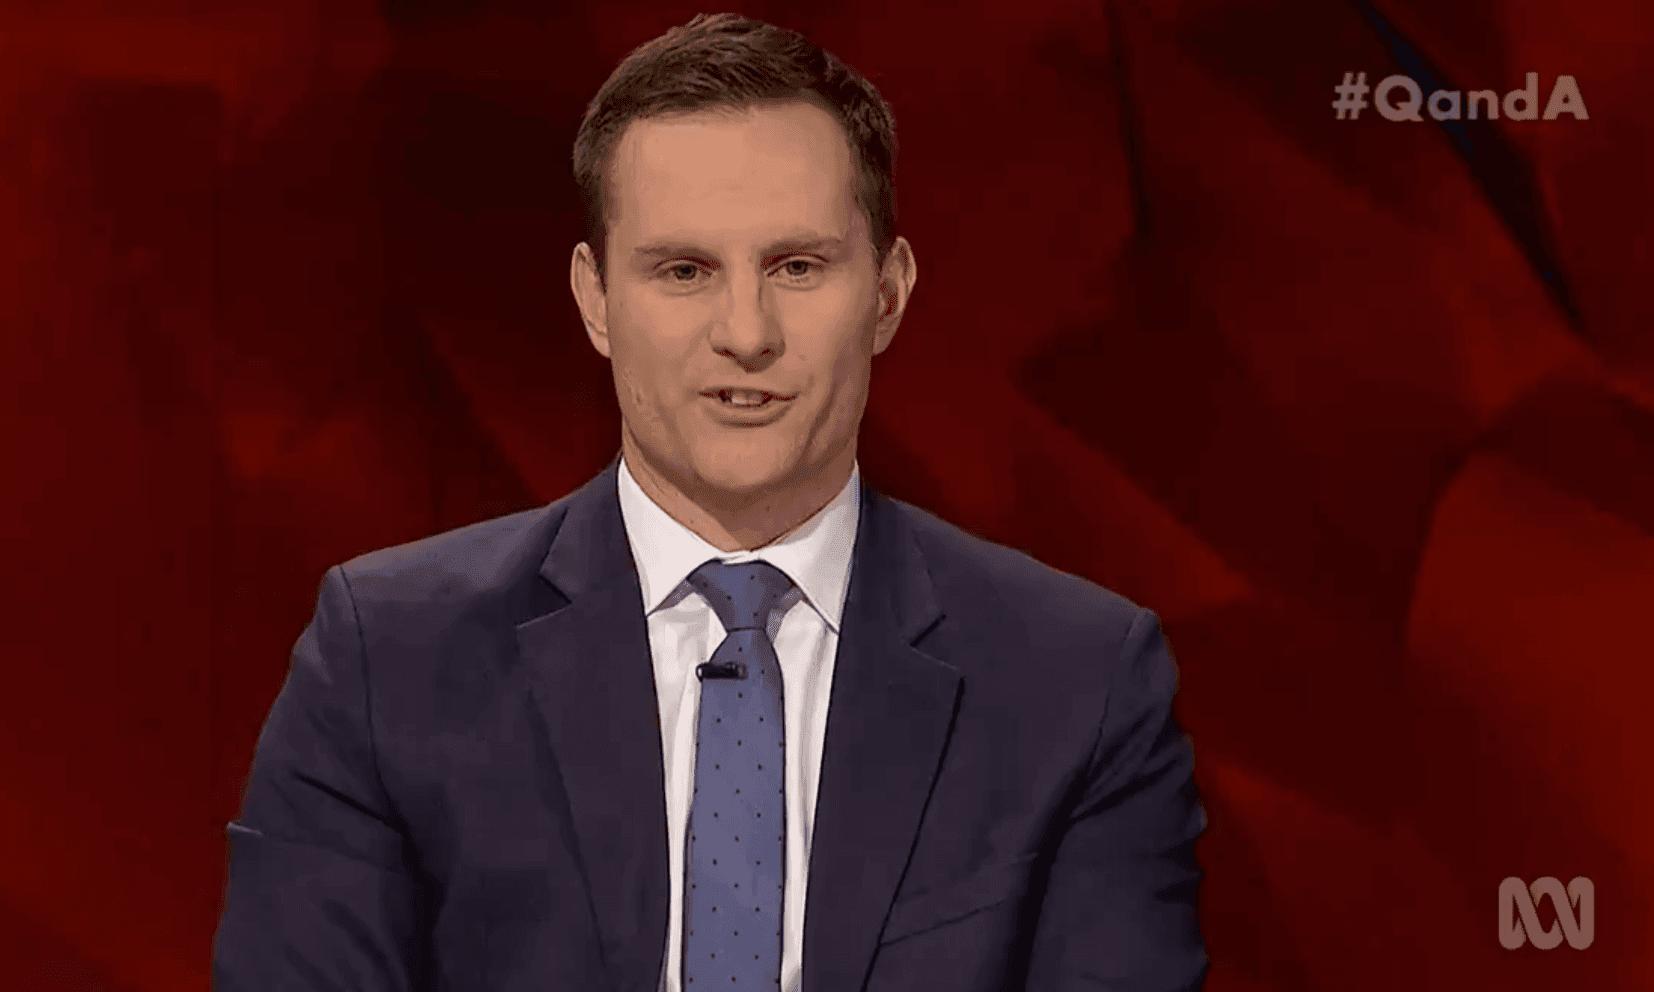 Q&A panel clash over moving Australia's Israel embassy to Jerusalem